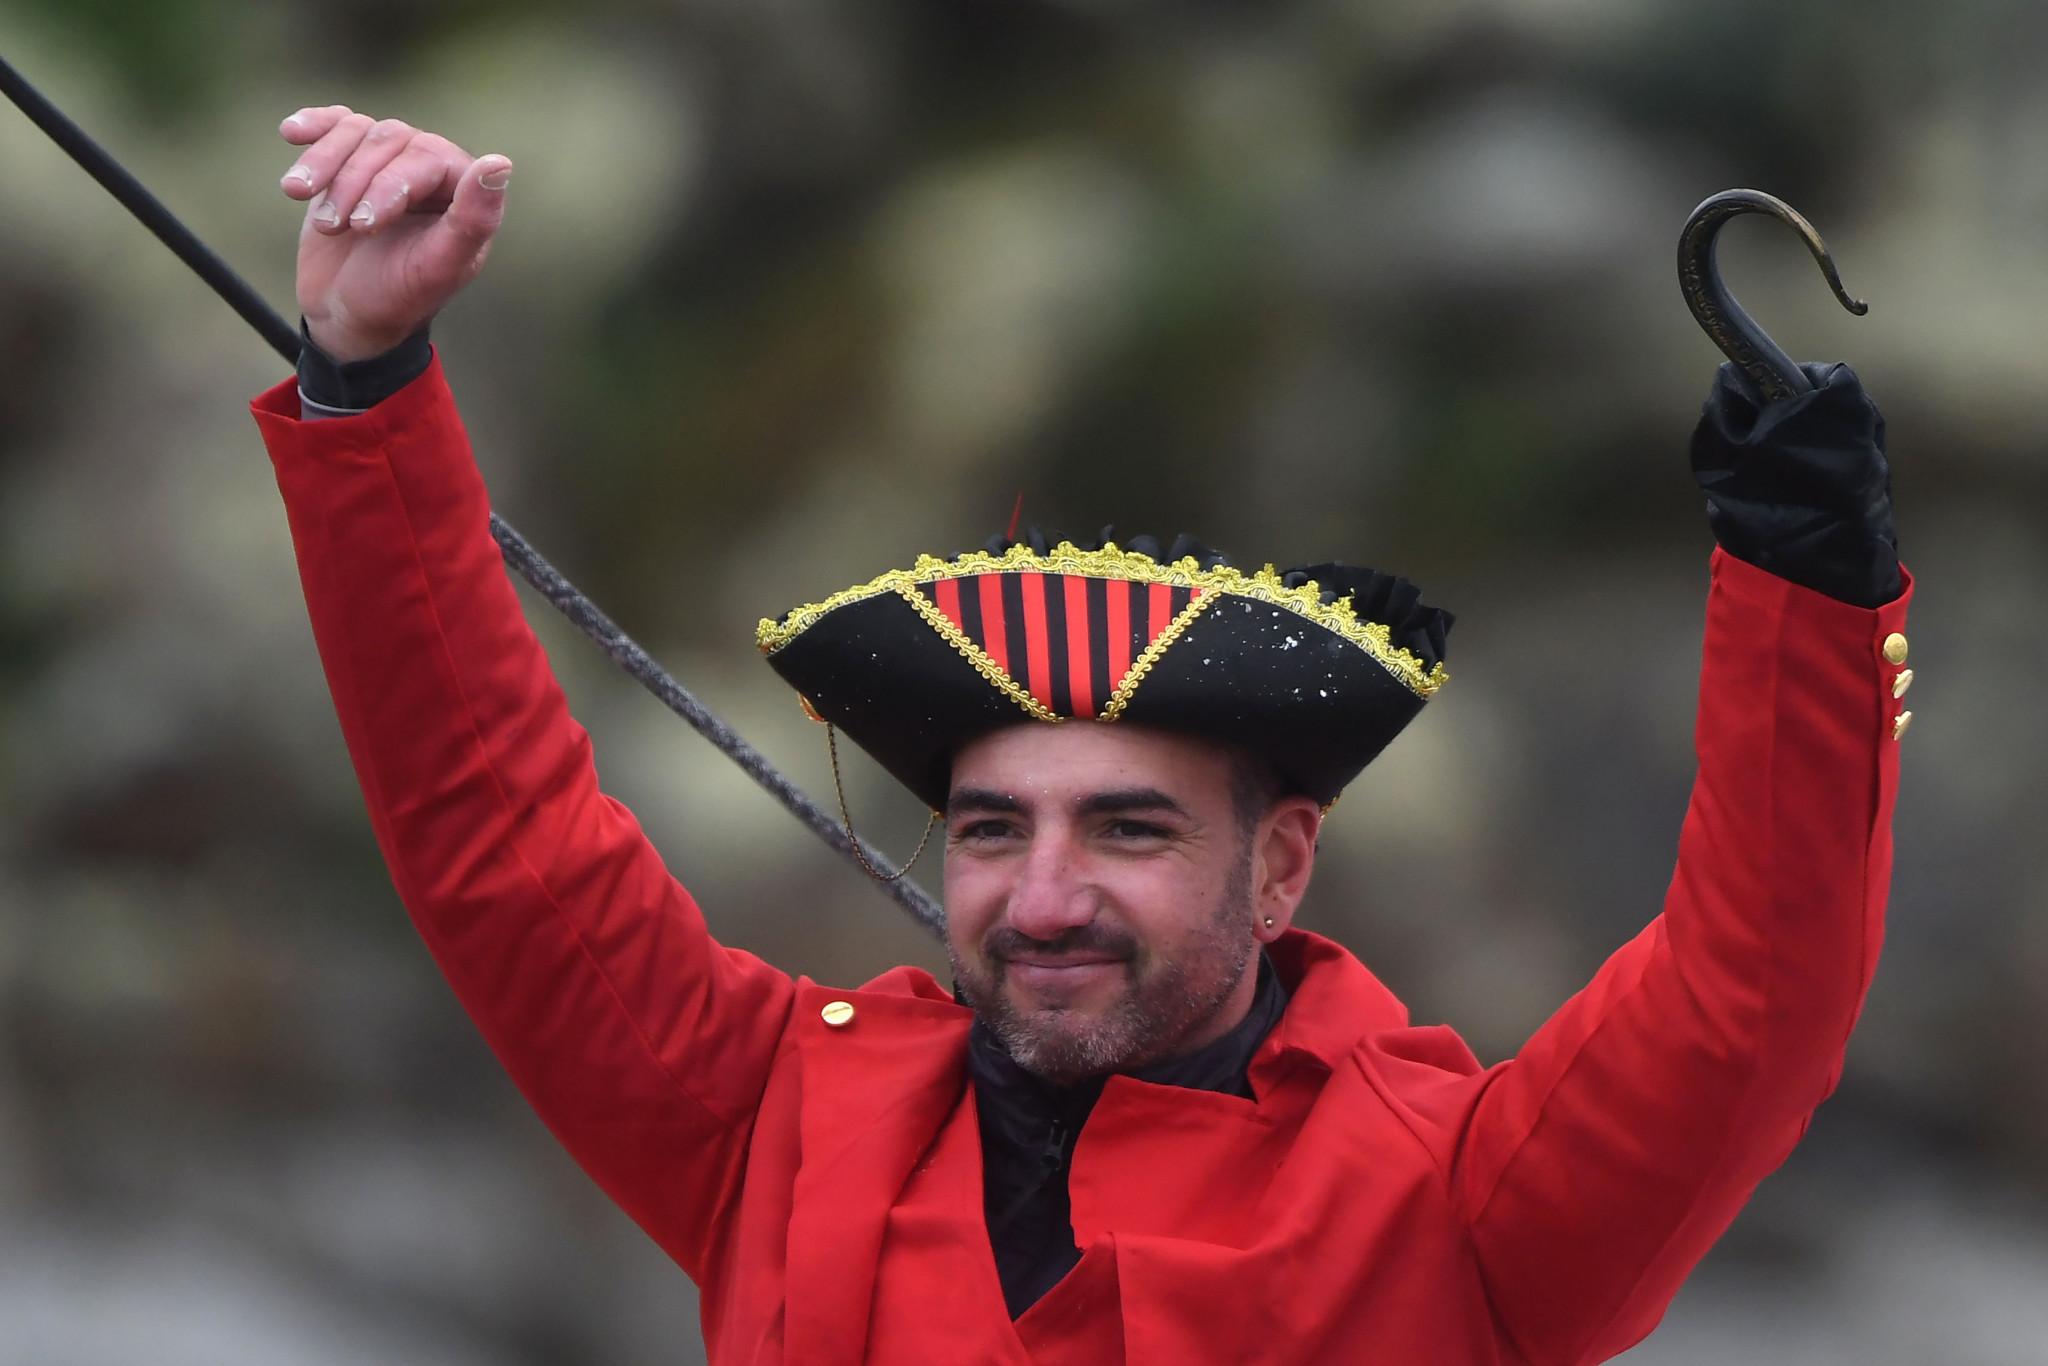 Damien Seguin finished the Vendée Globe dressed as Captain Hook ©Getty Images